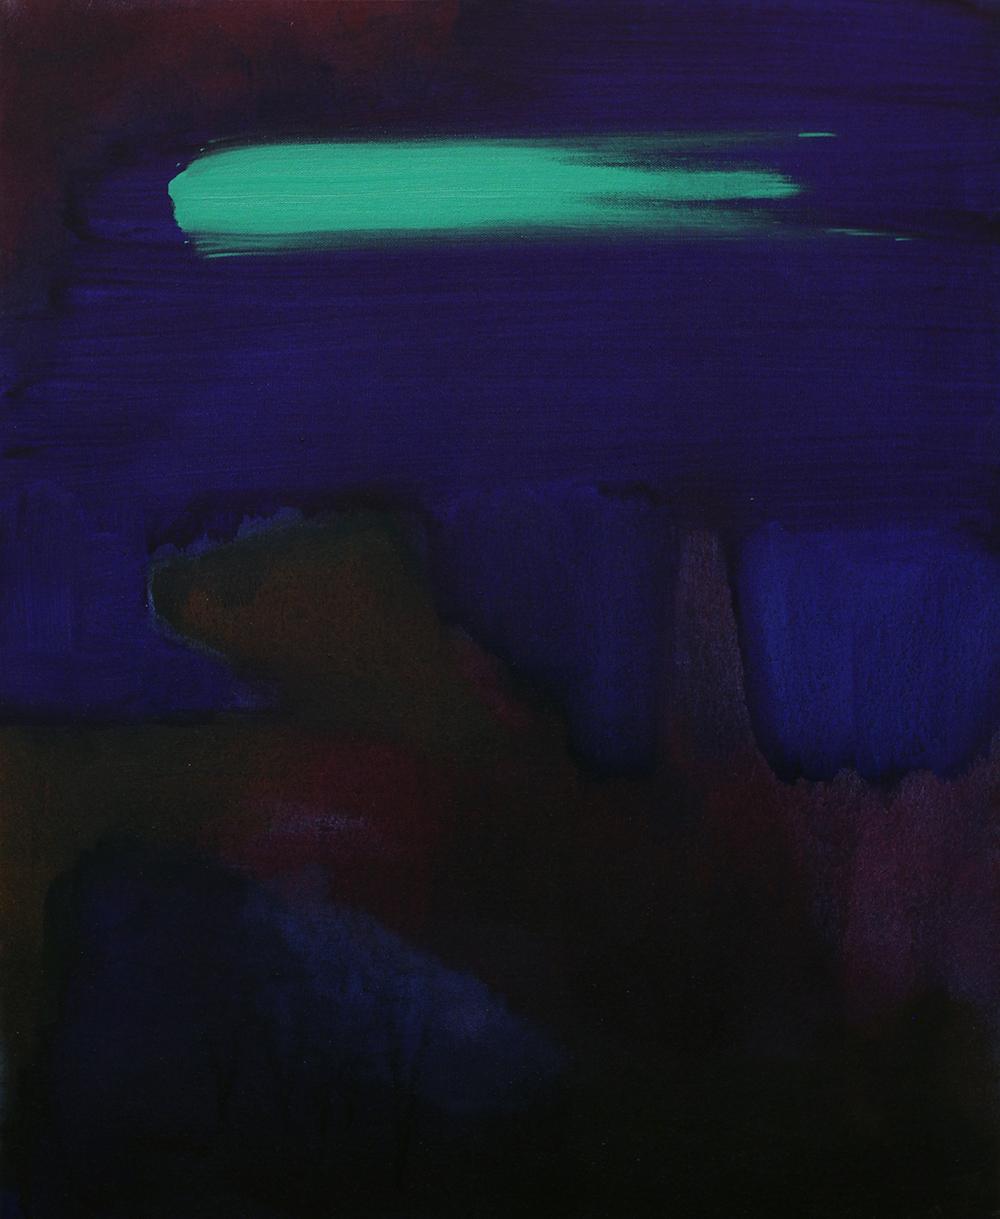 Green streak, 2014, oil on canvas, 21 x 25.5